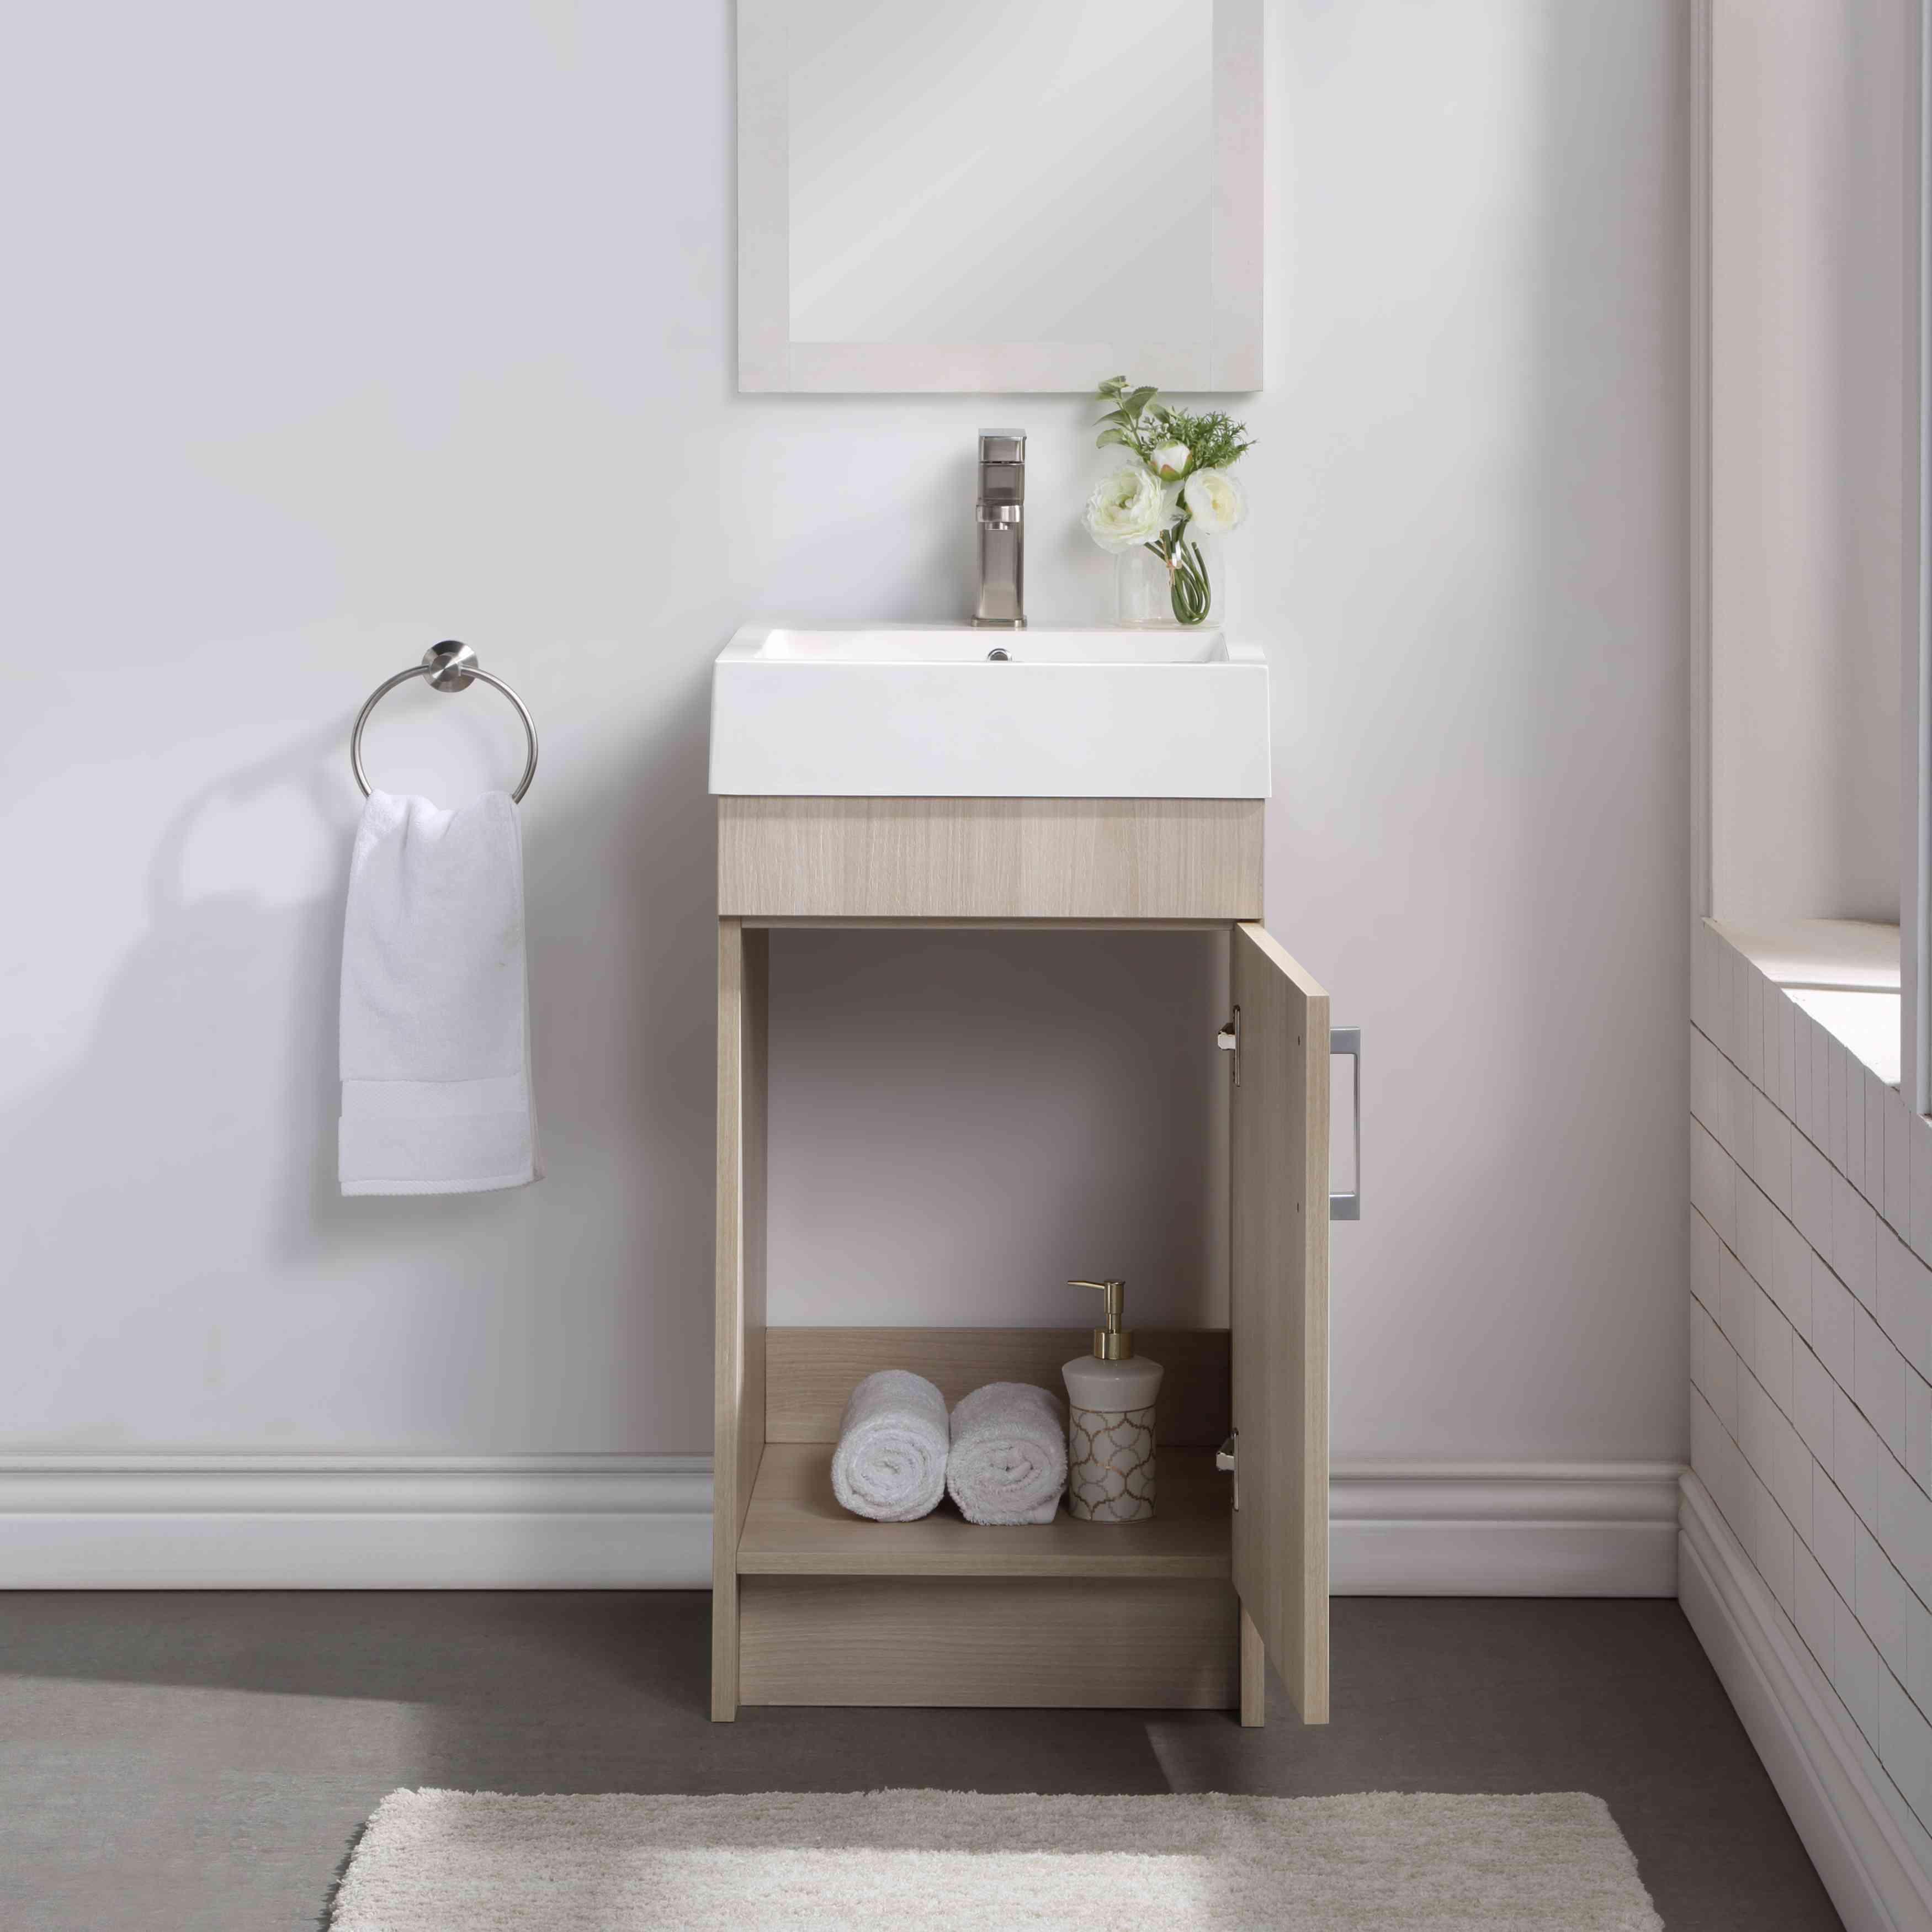 Mainstays Farmhouse Single Sink Bathroom Vanity